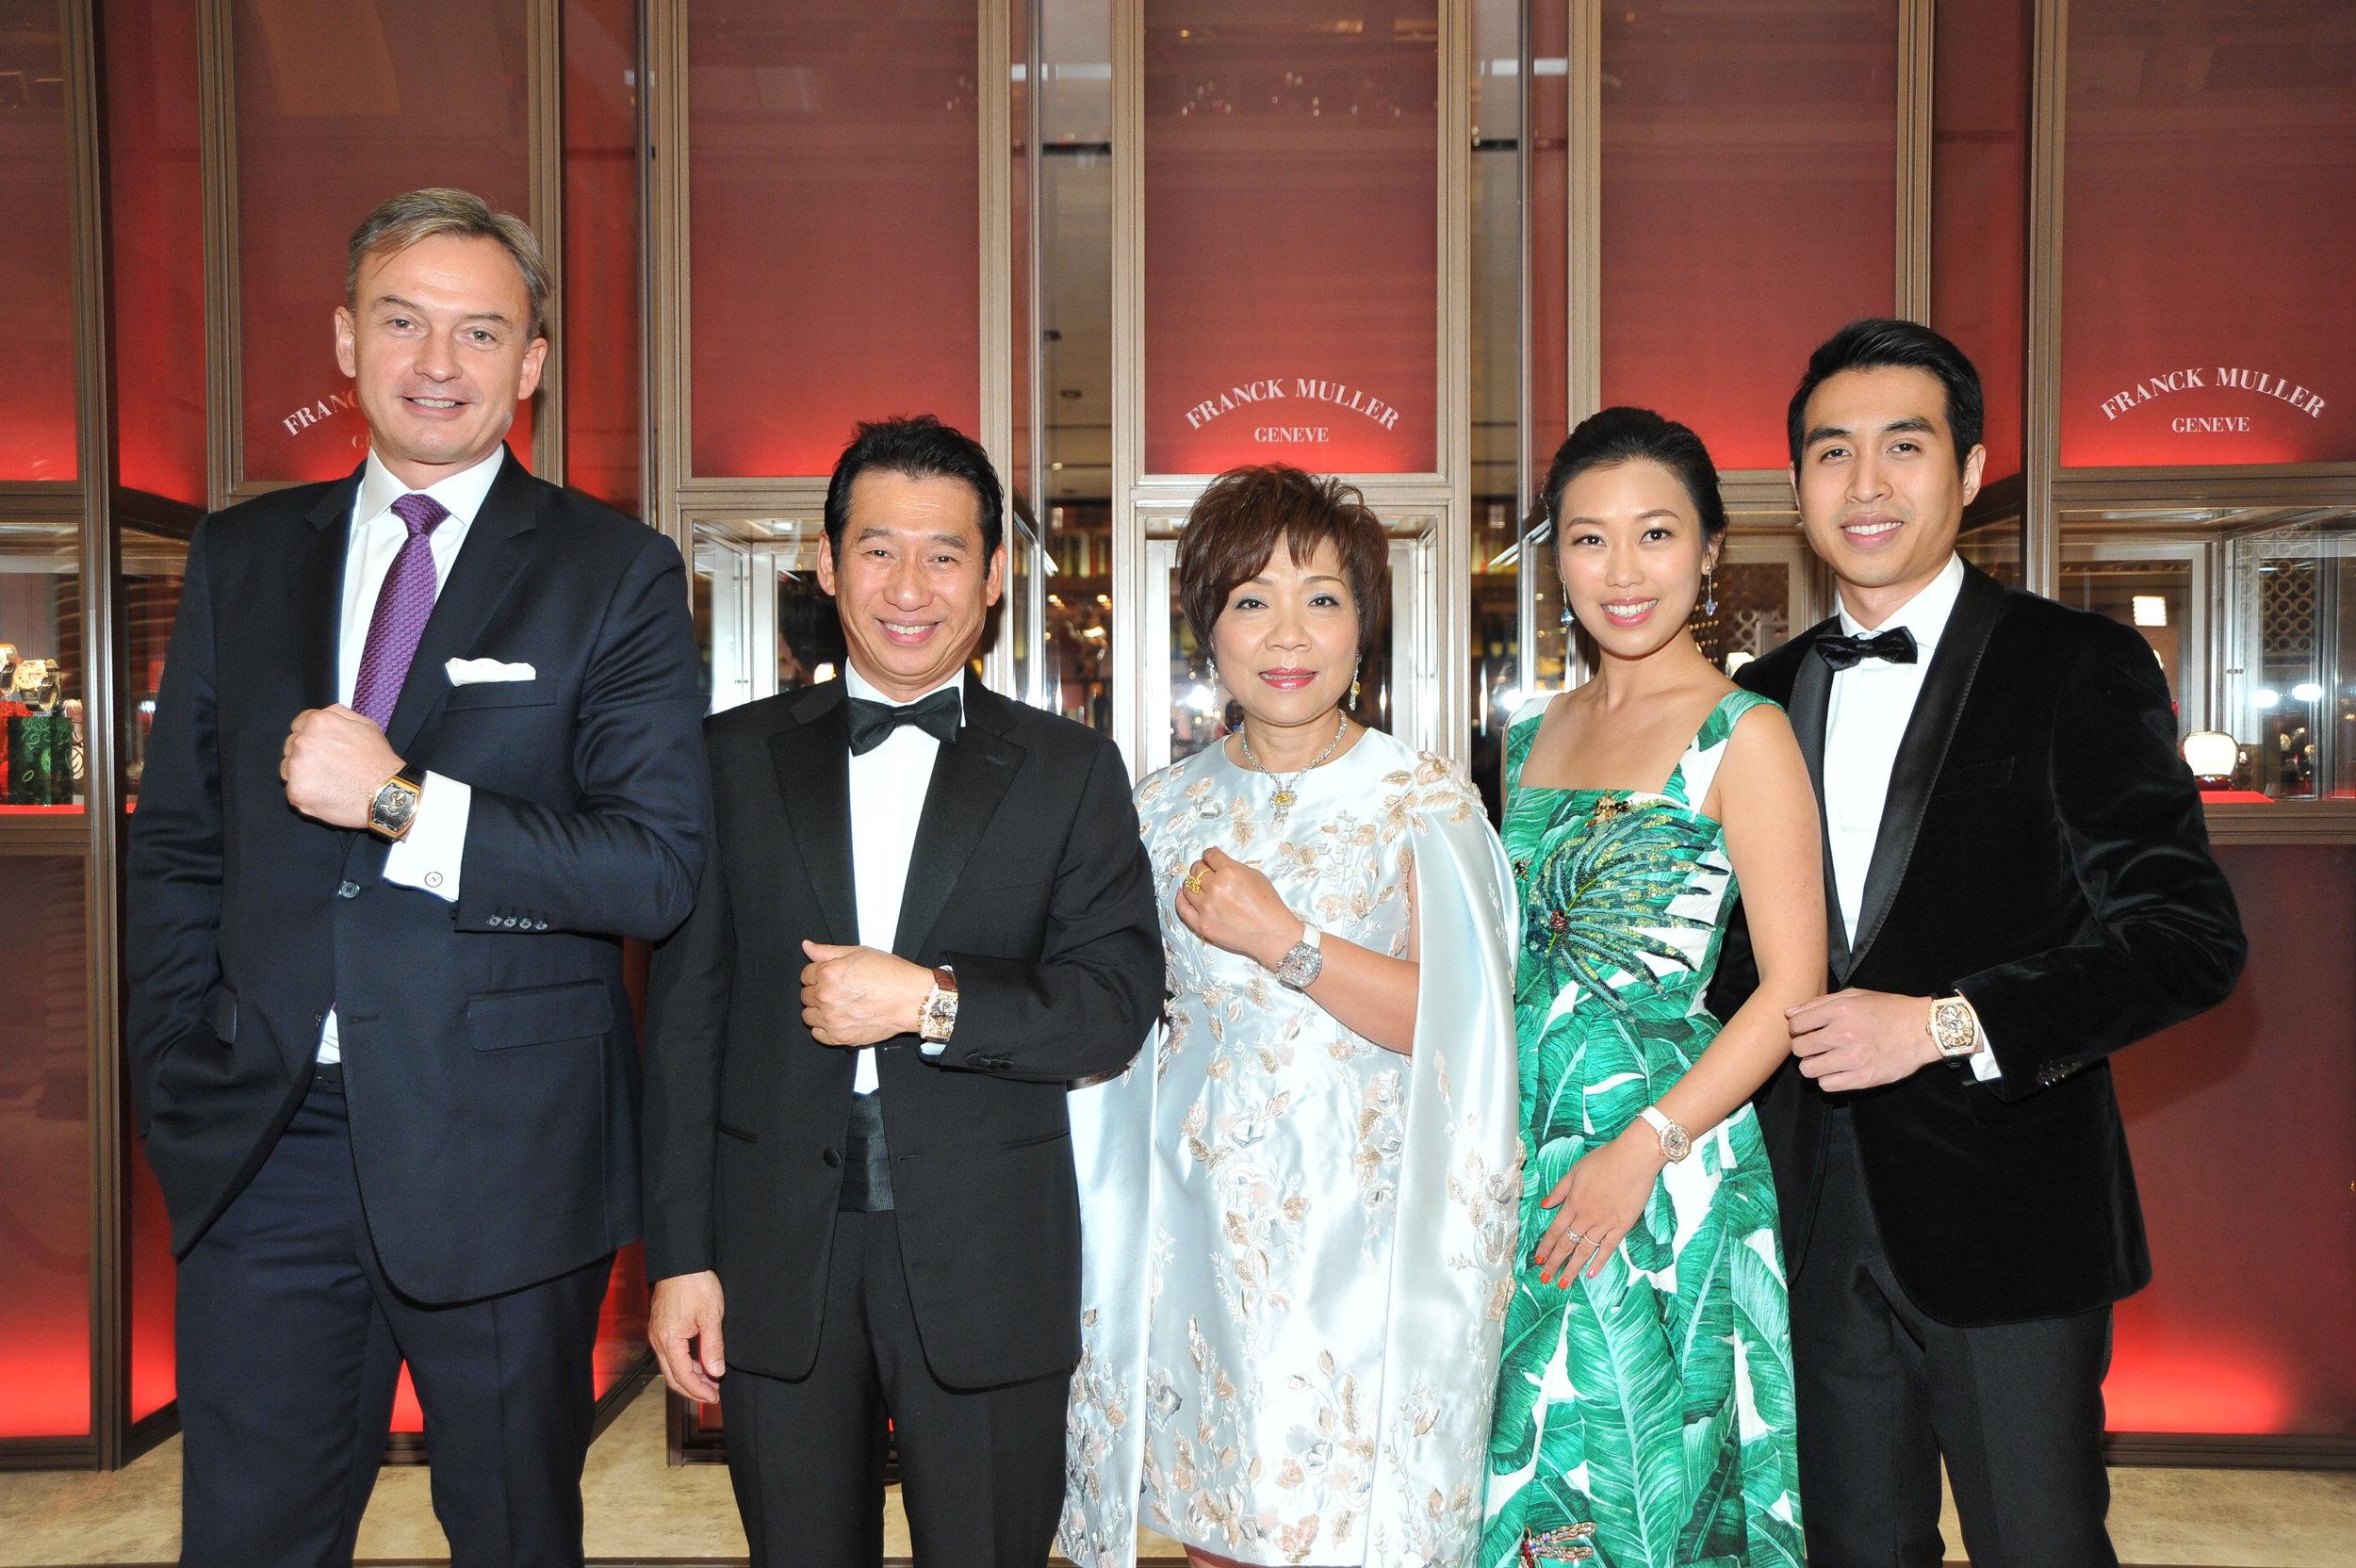 Franck-Muller-Grand-Opening-Macau-Guest.JPG